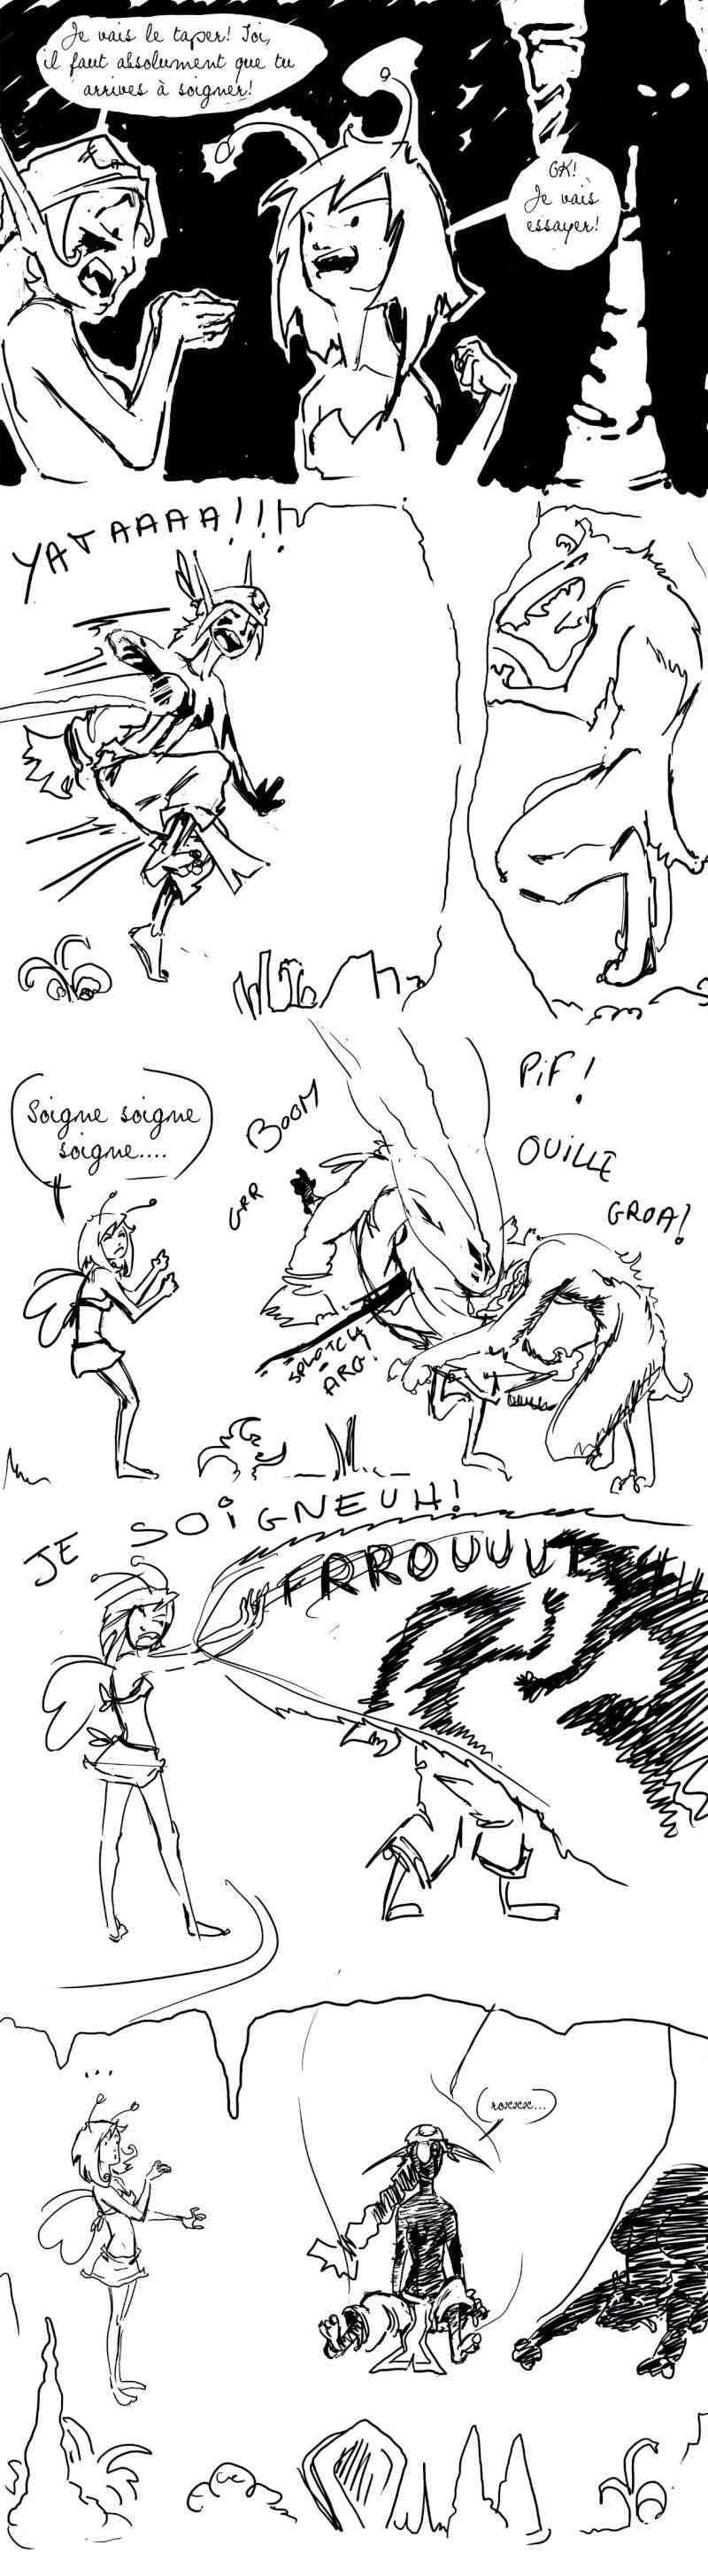 seik et ekis, les aventures ILLUSTREES - Page 4 Strip110